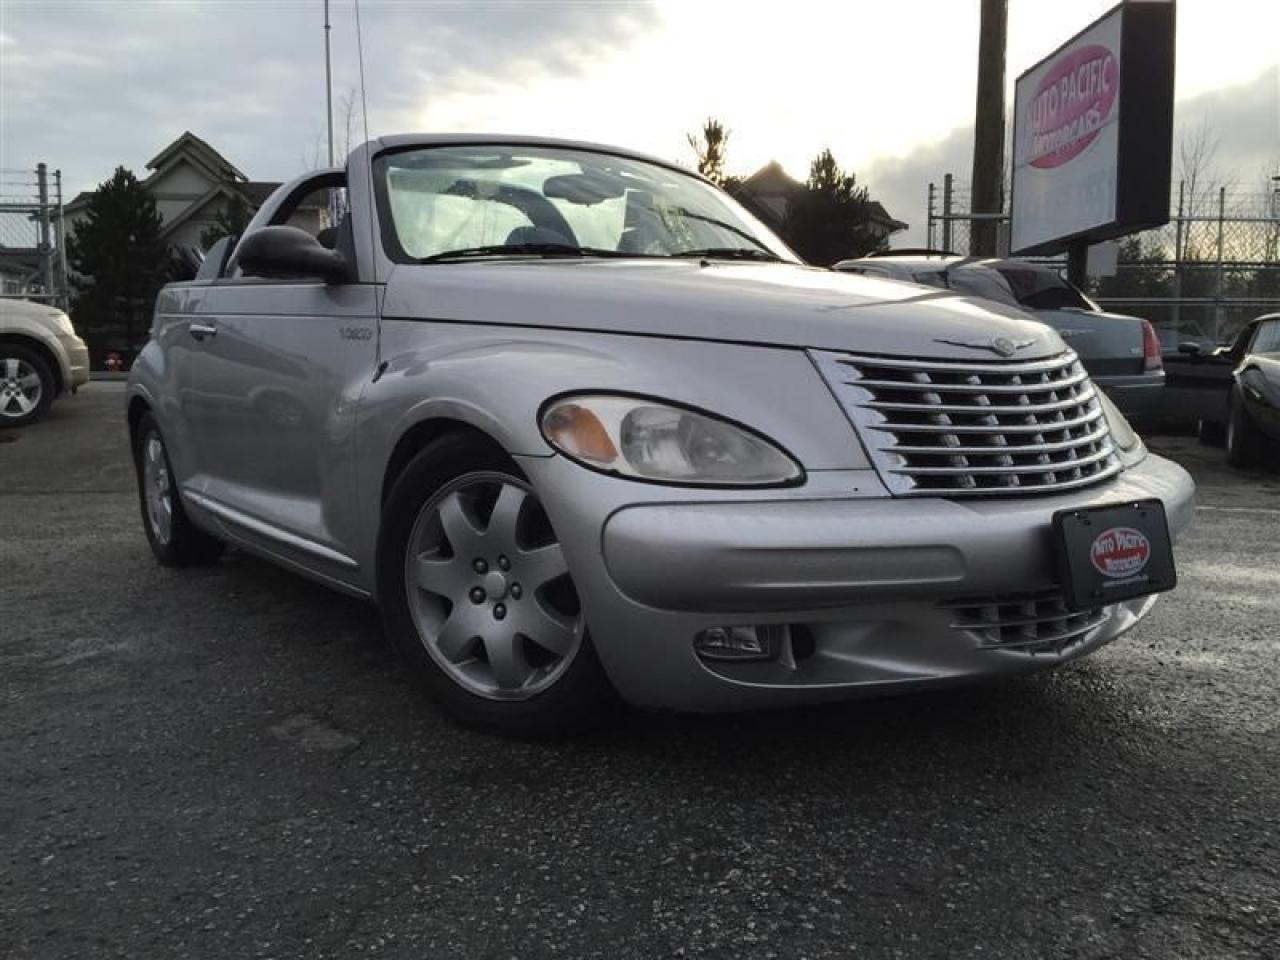 Photo of Silver 2005 Chrysler PT Cruiser